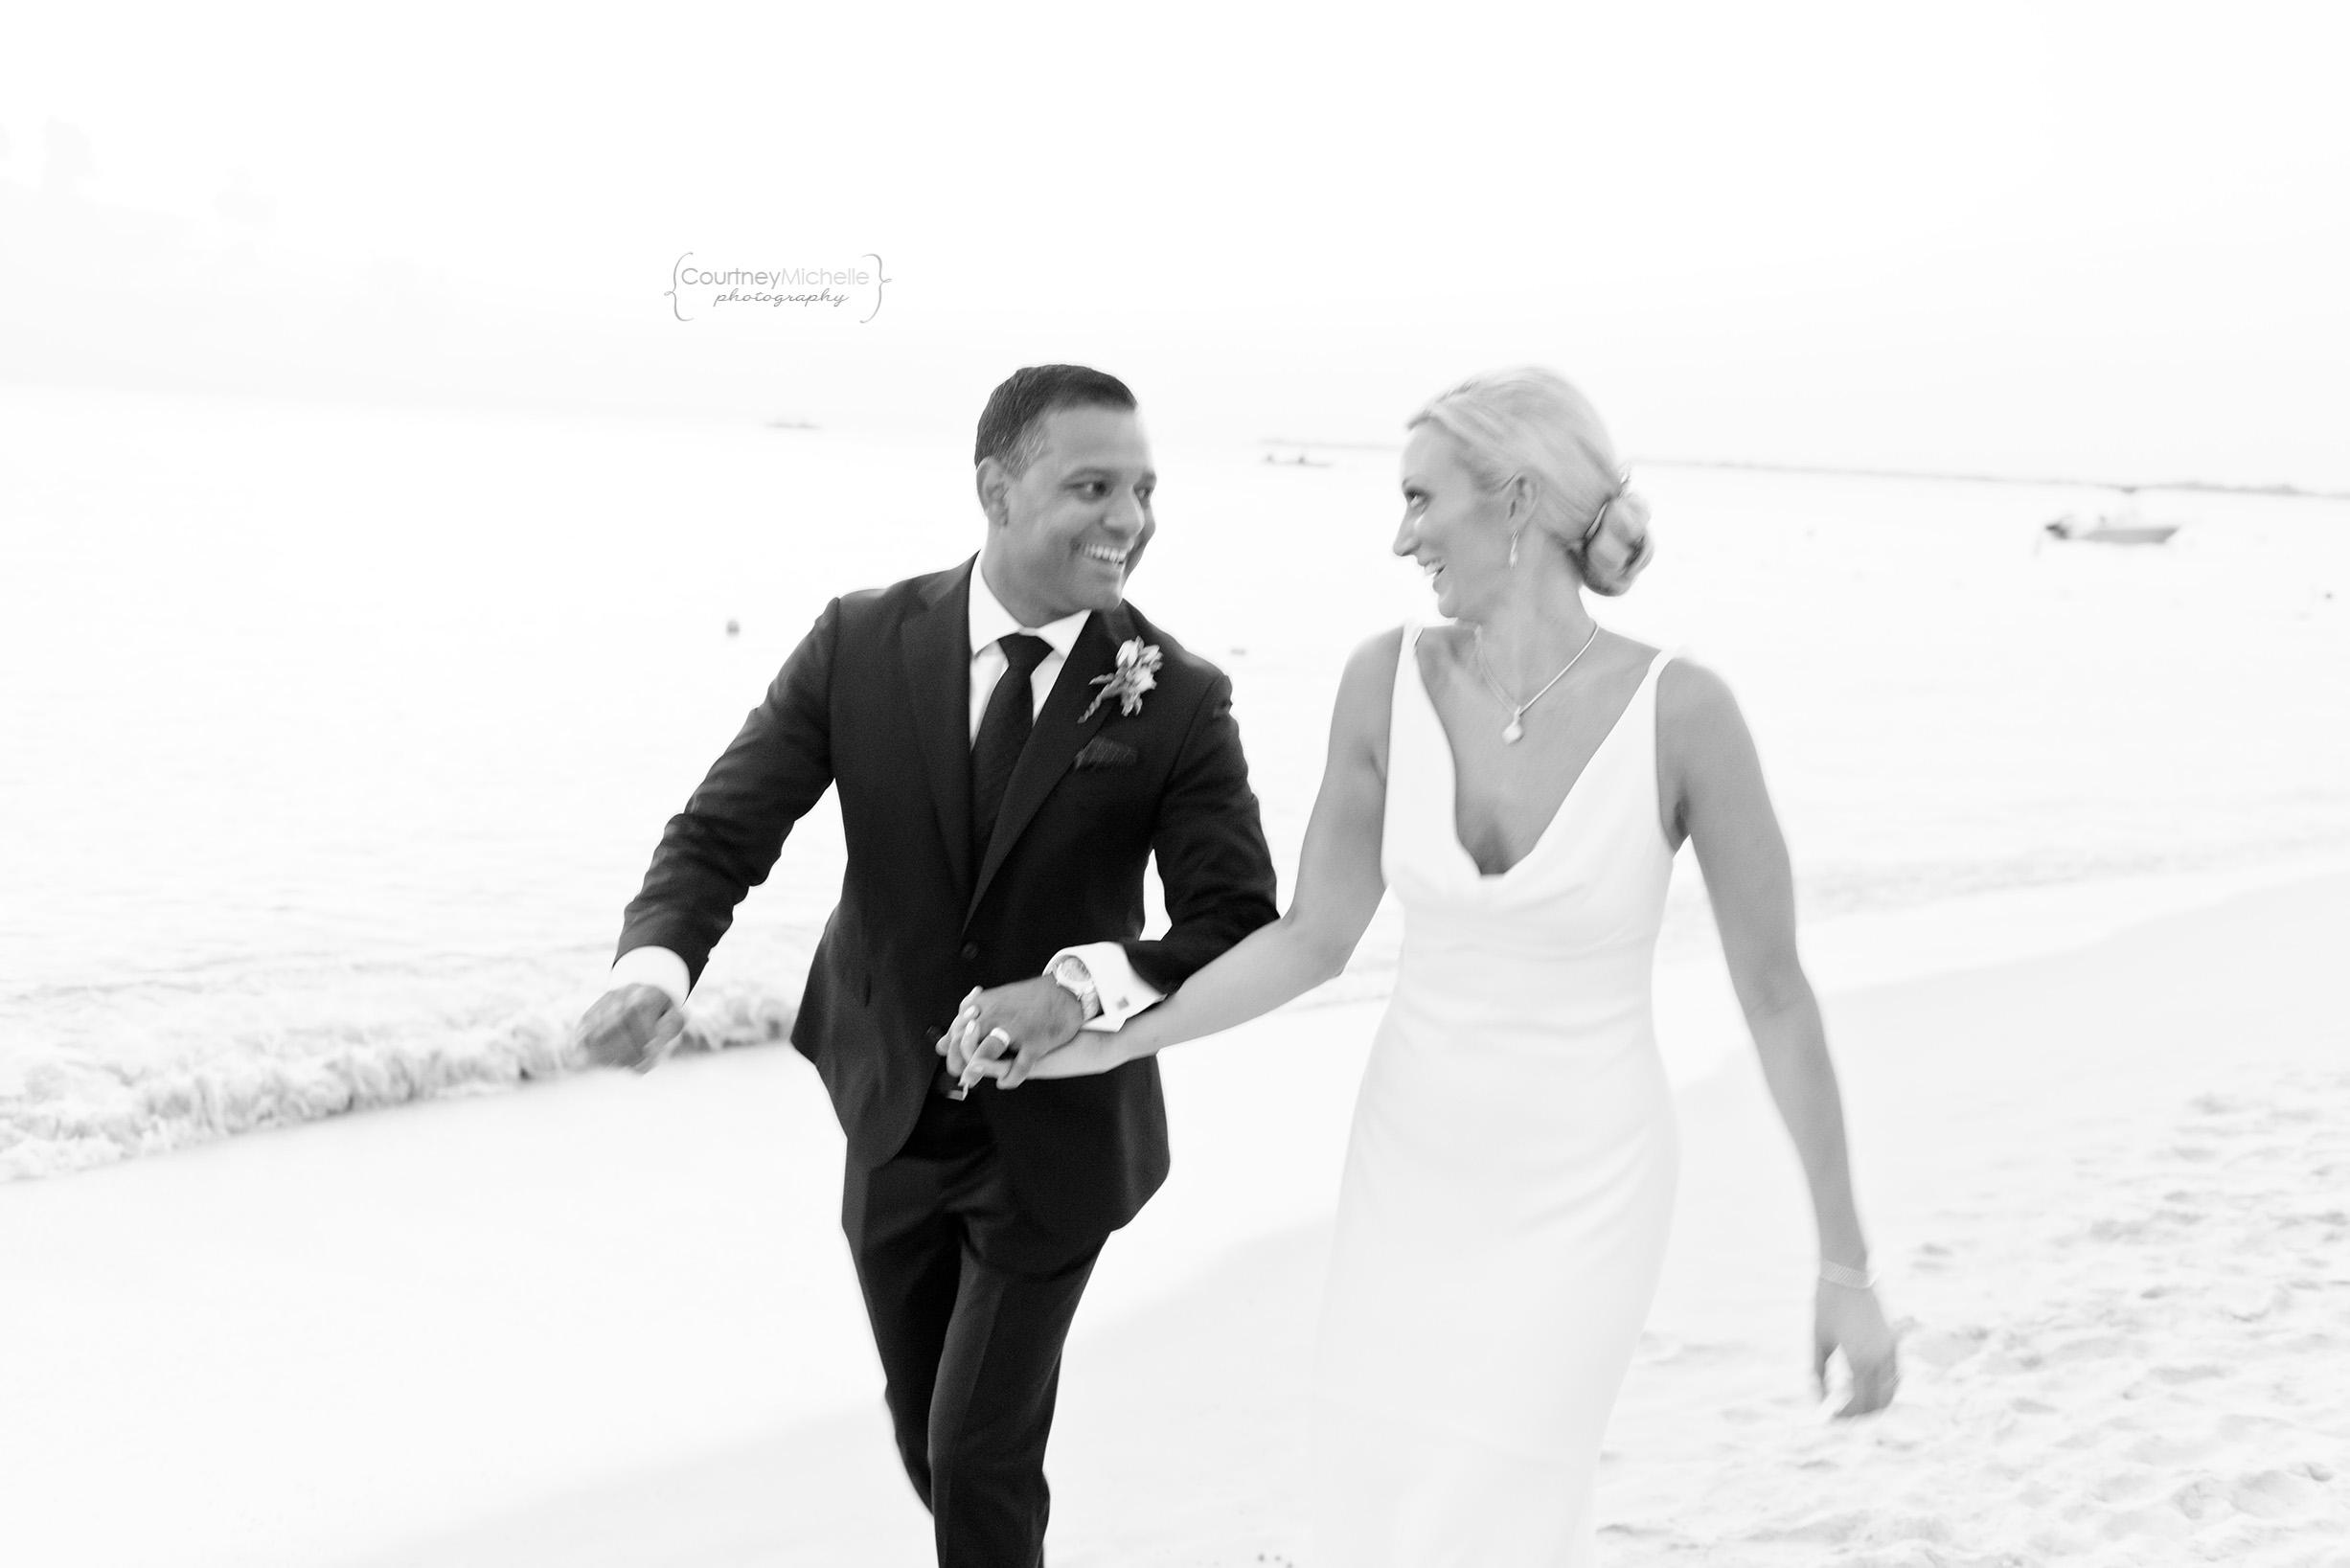 bride-and-groom-portrait-grand-cayman-beach-wedding-photography-by-courtney-laper©CopyrightCMP-LeaAnneRaj-8009.jpg